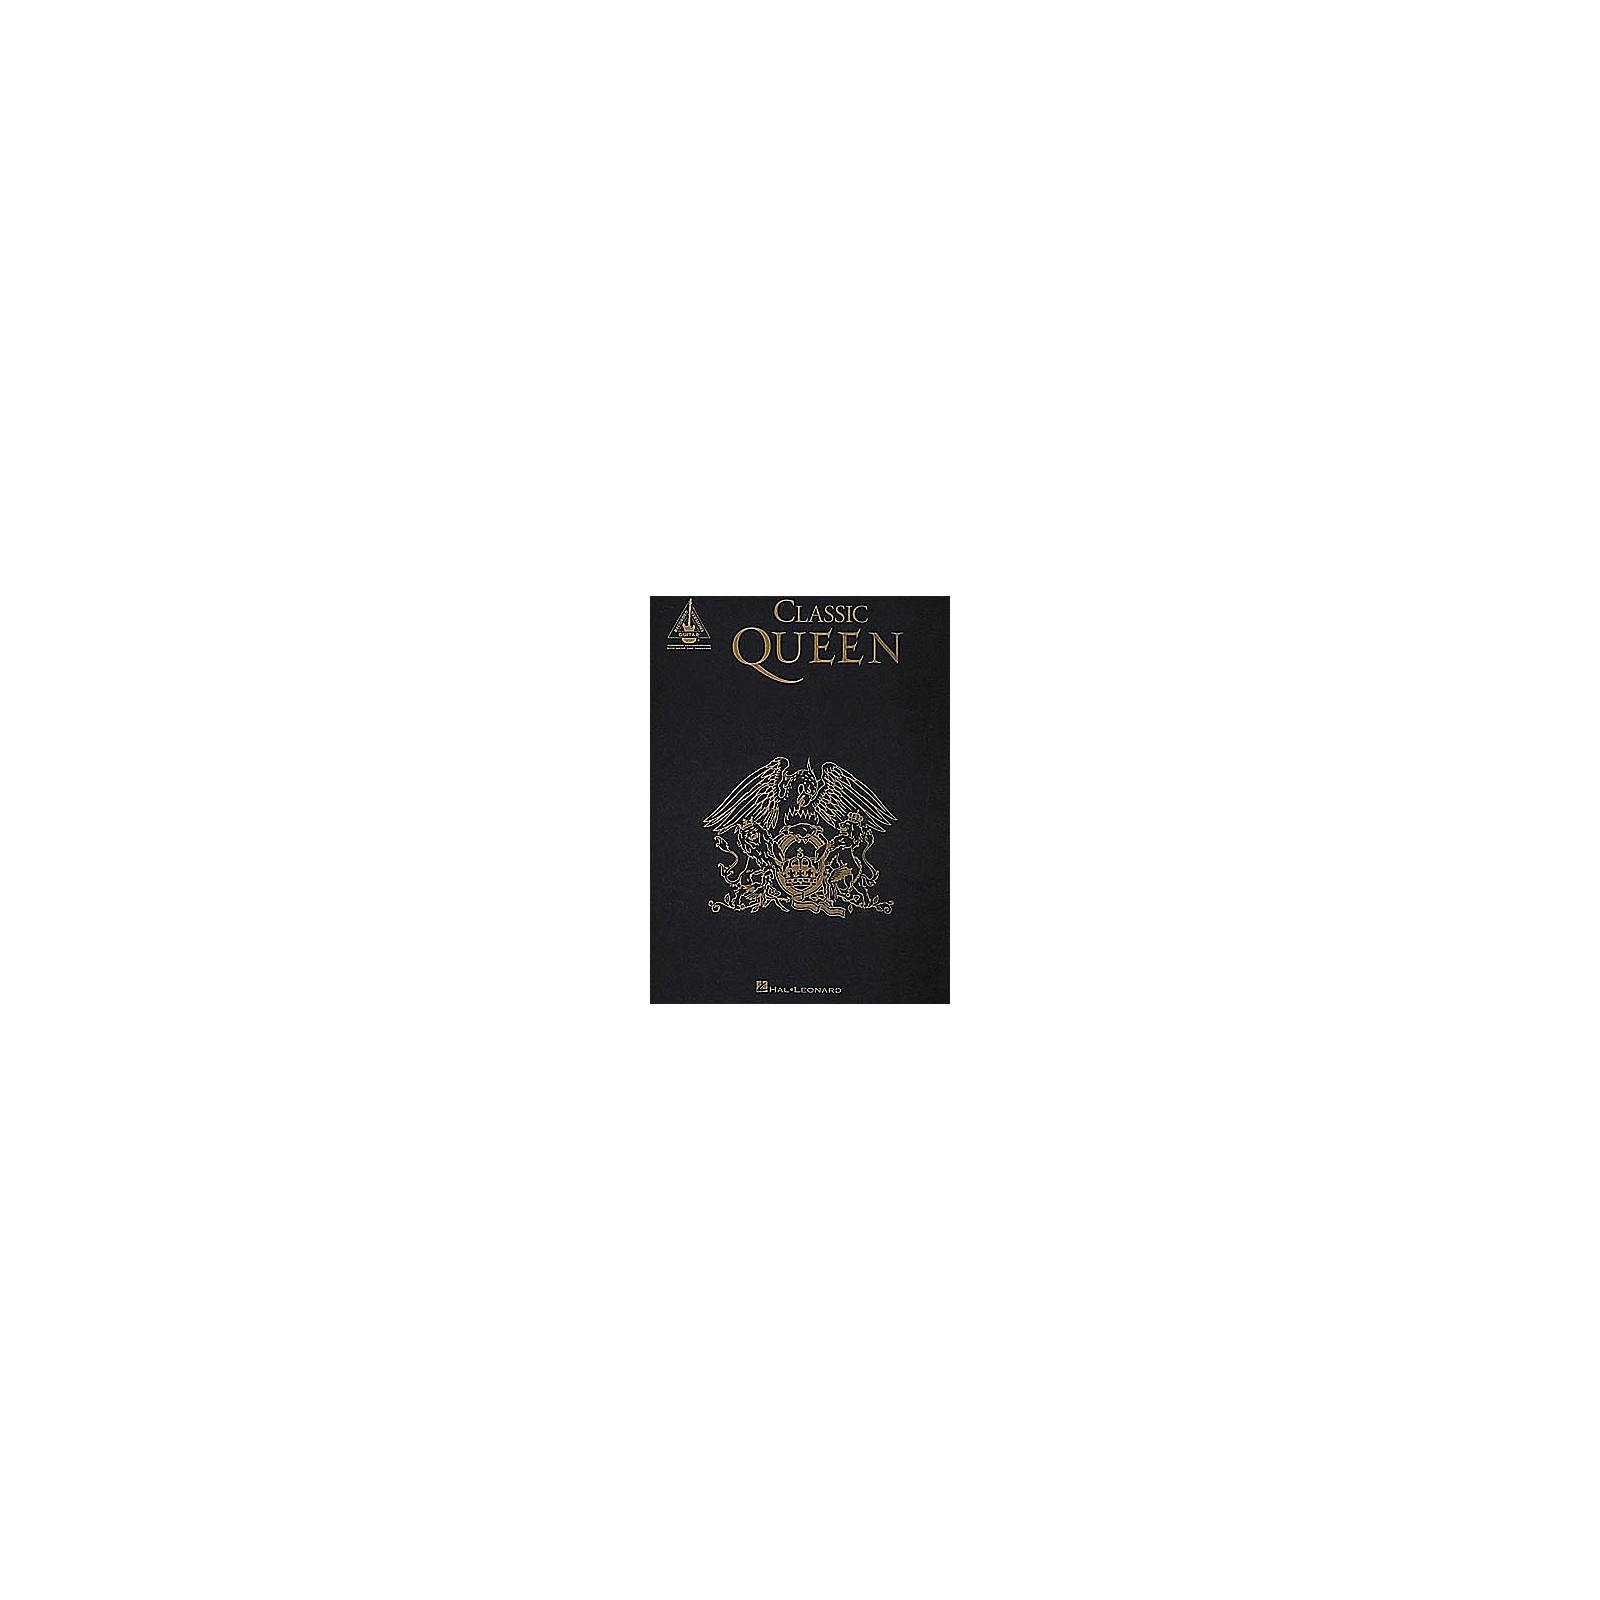 Hal Leonard Classic Queen Guitar Tab Book